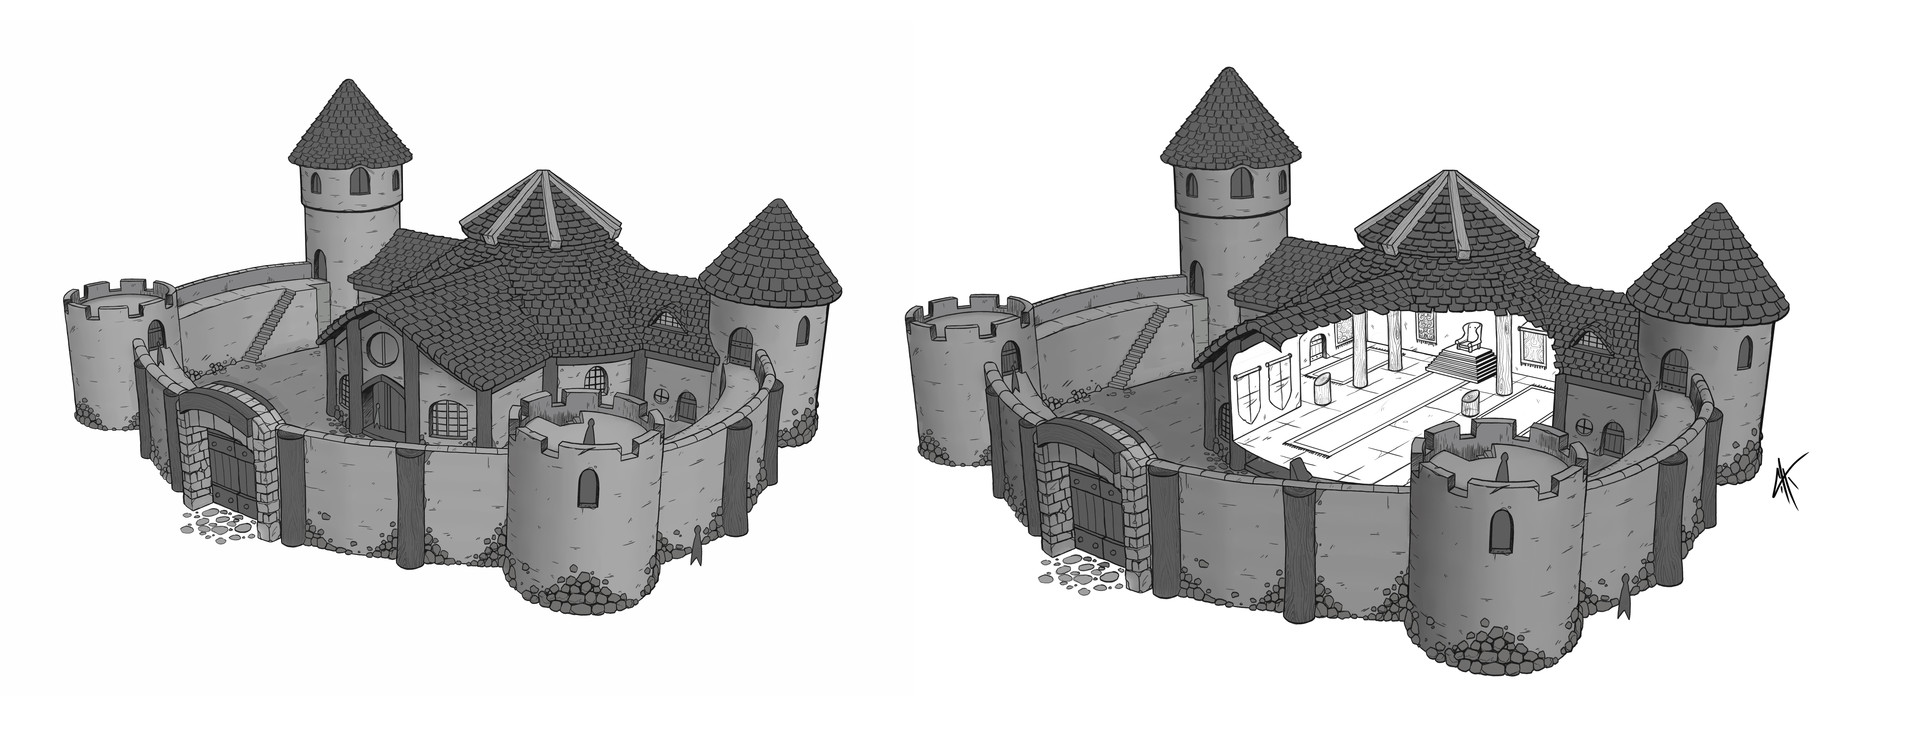 Christopher hayes cobb castle